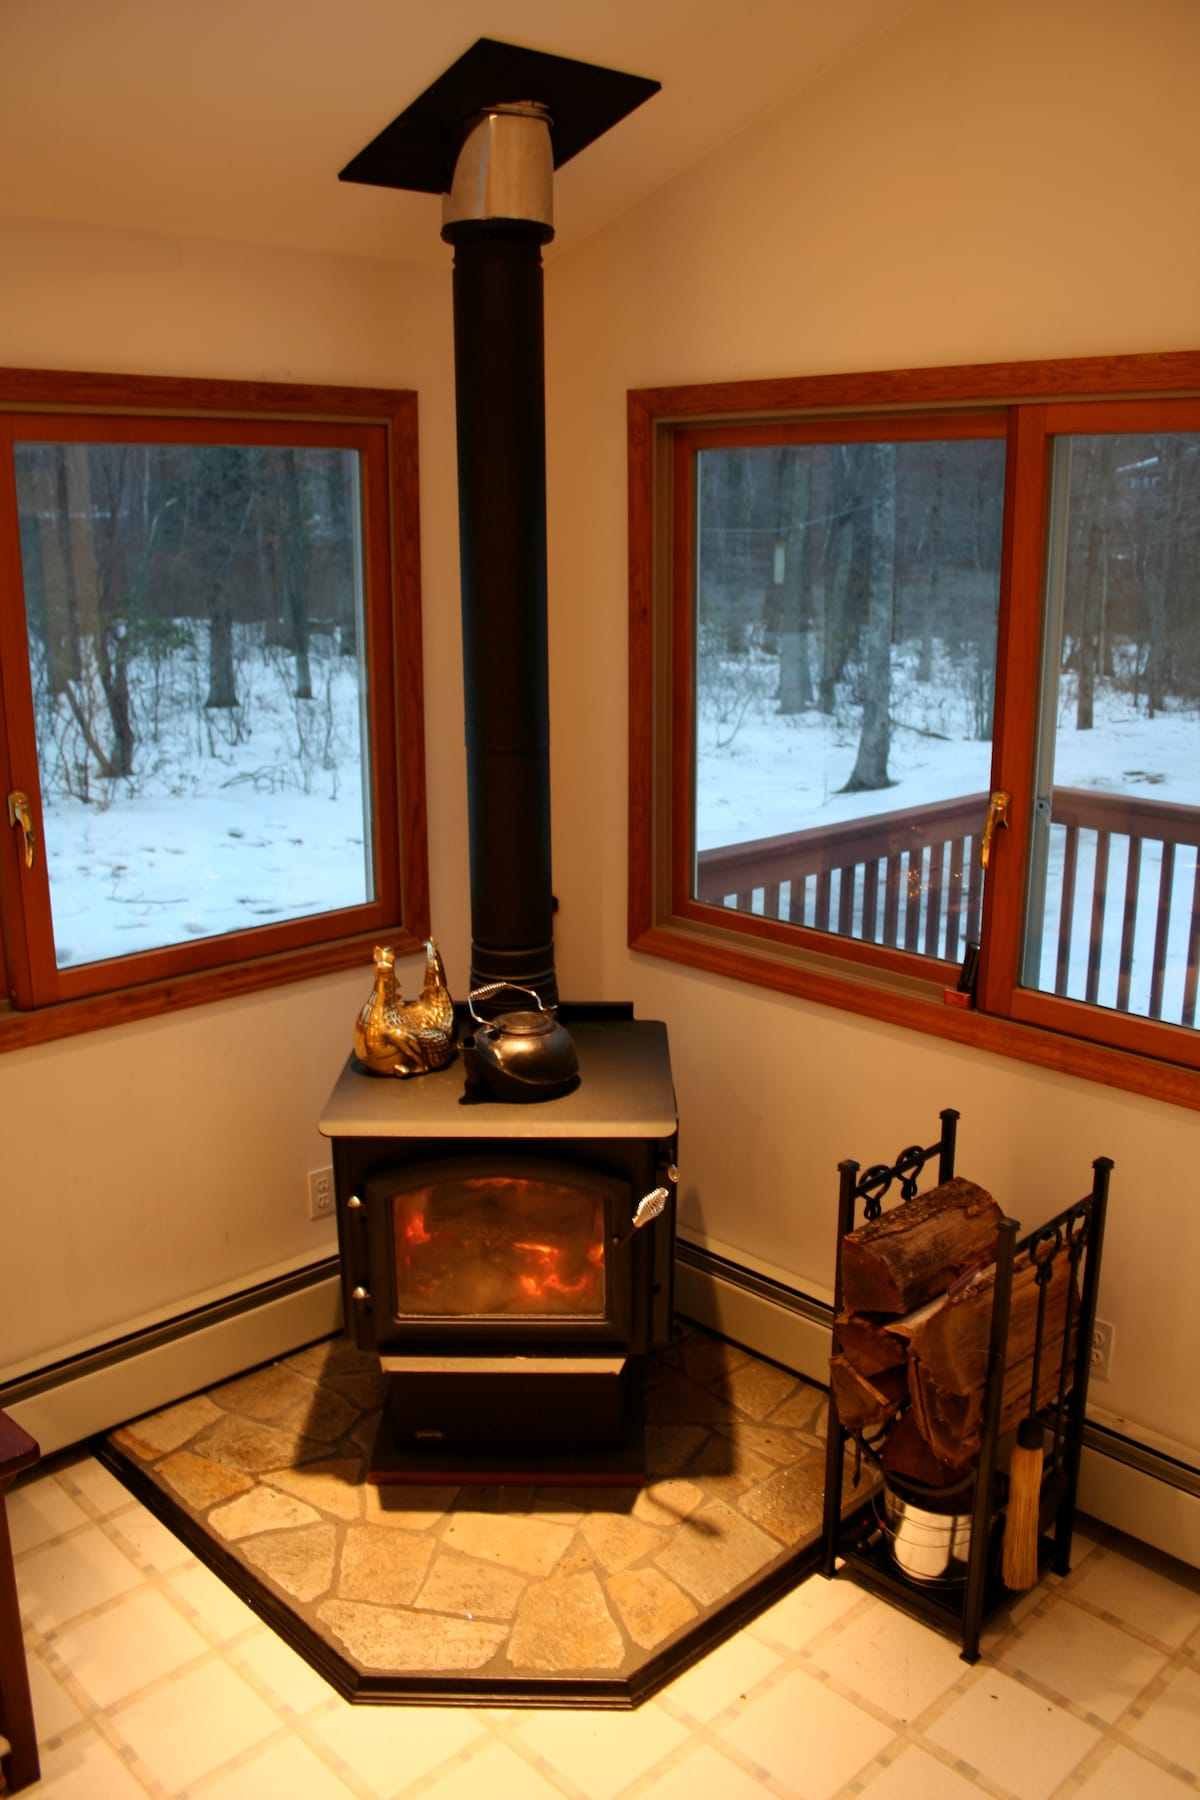 Cozy Wood Burning Stove & Hearth